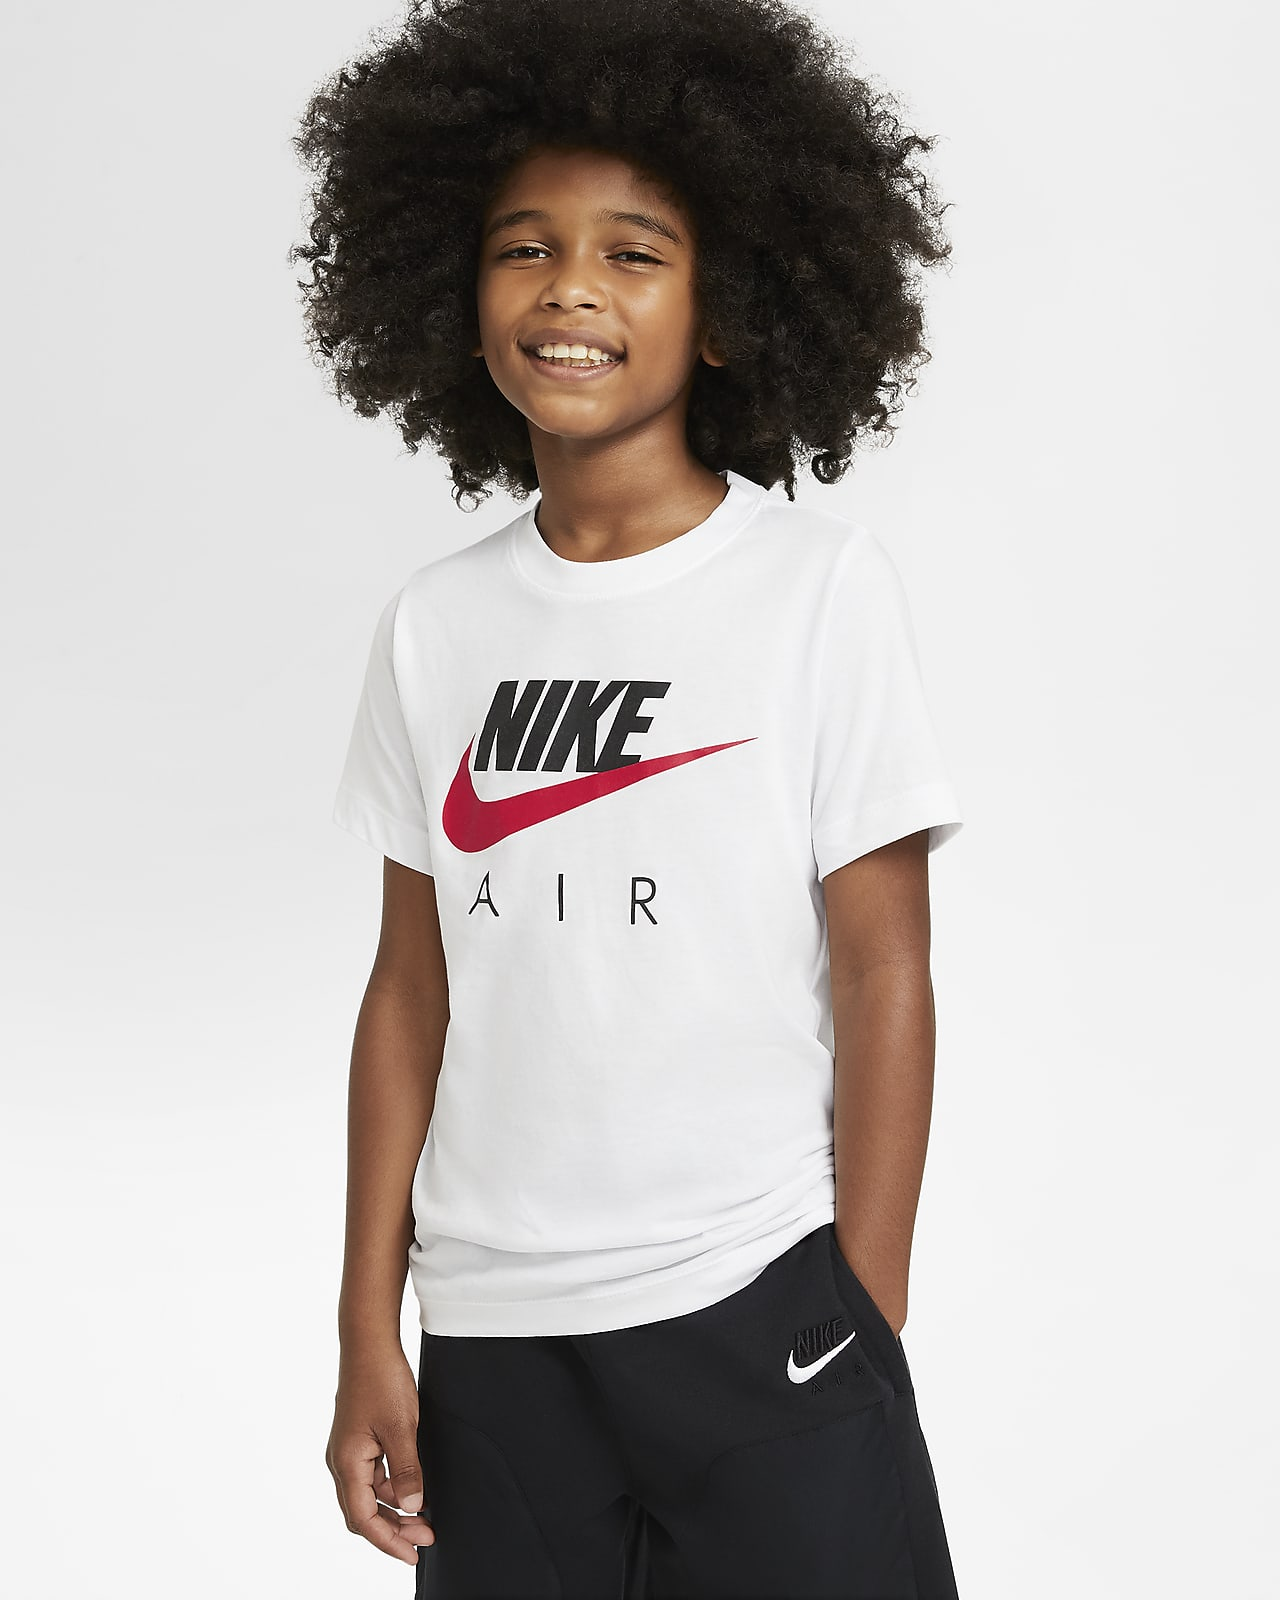 Nike Air Genç Çocuk (Erkek) Tişörtü